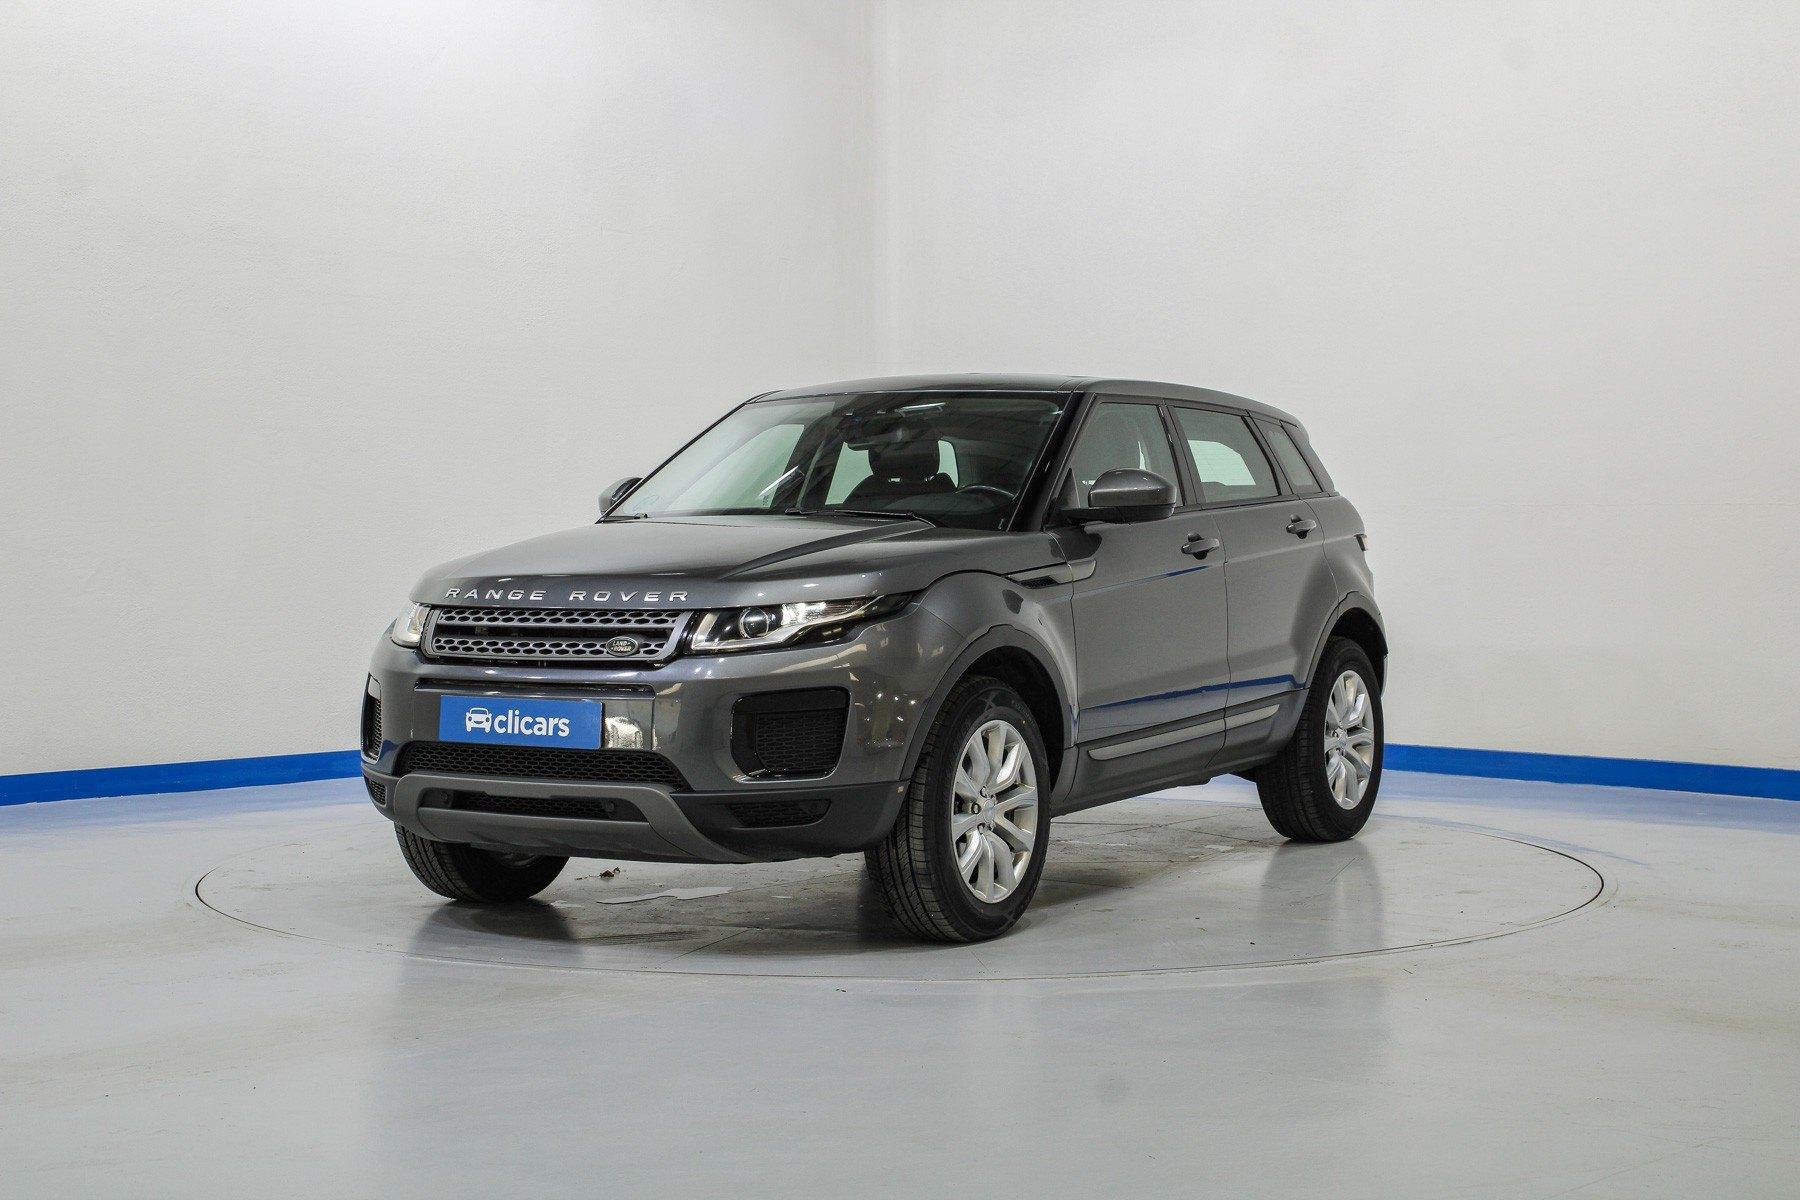 Land Rover Range Rover Evoque Diésel 2.0L eD4 Diesel 110kW (150CV) 4x2 Pure 1